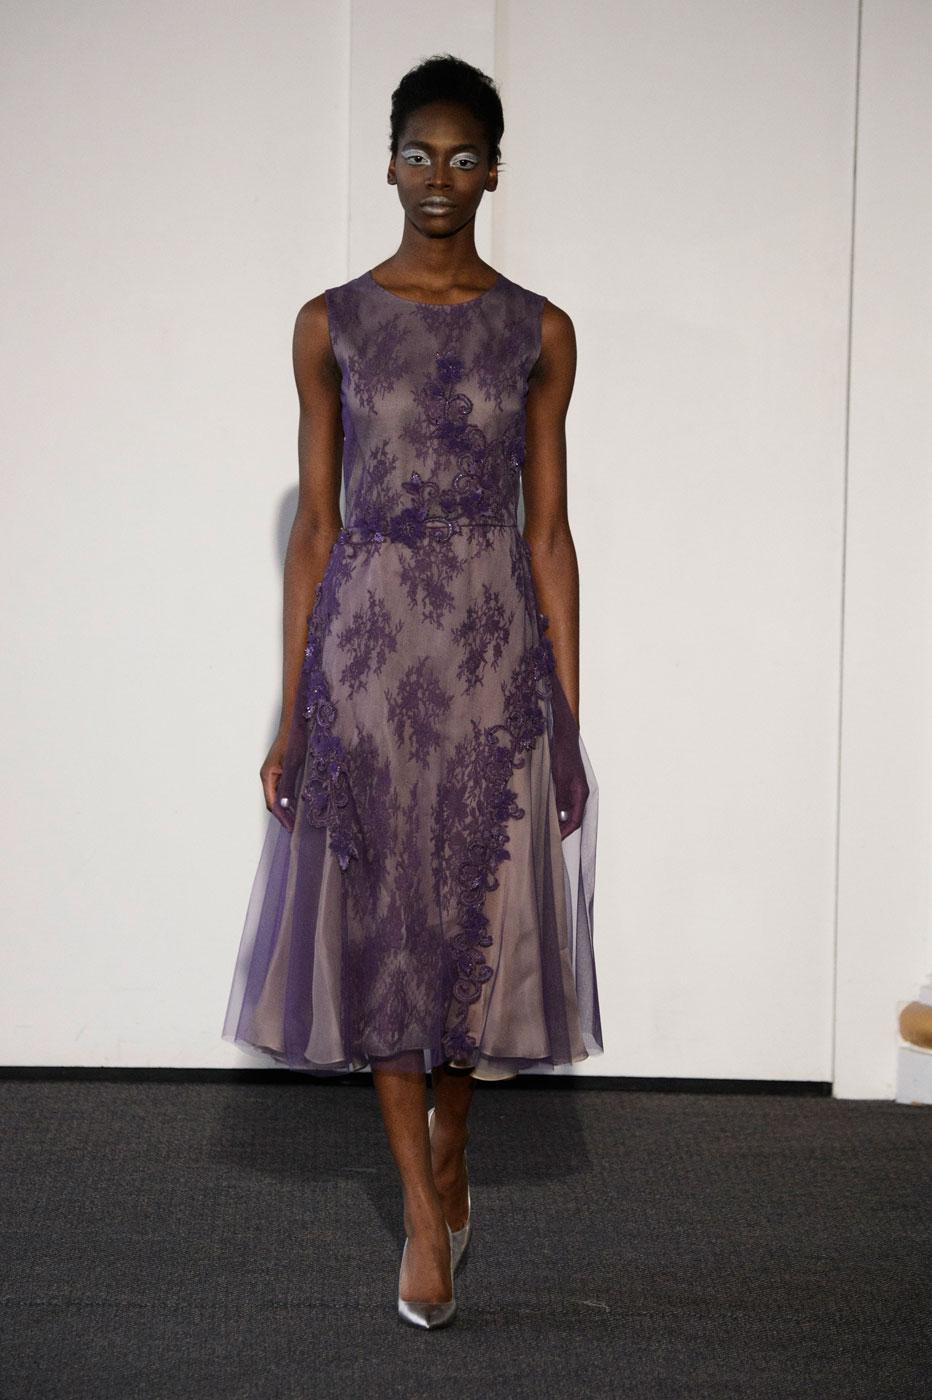 Busardi-fashion-runway-show-haute-couture-paris-spring-2015-the-impression-40